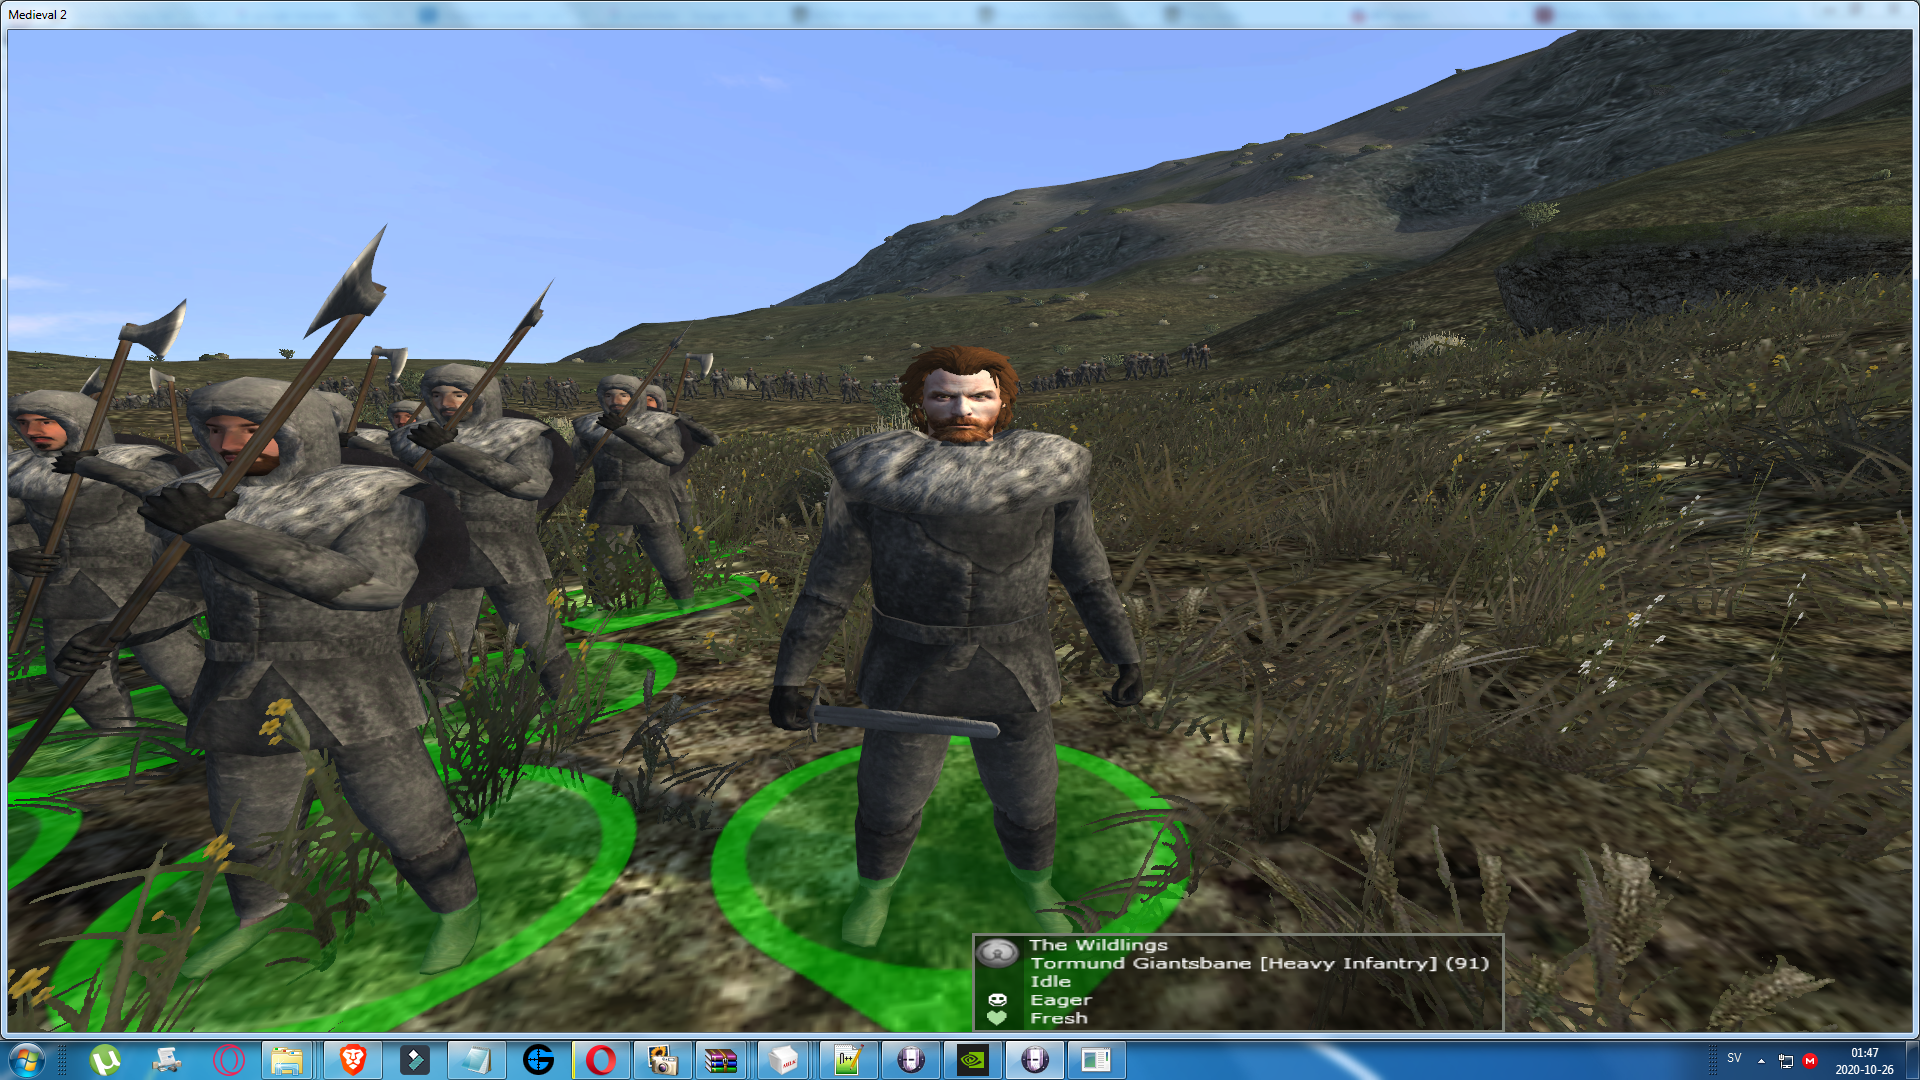 Tormund Giantsbane added as a new hero for the Wildlings!